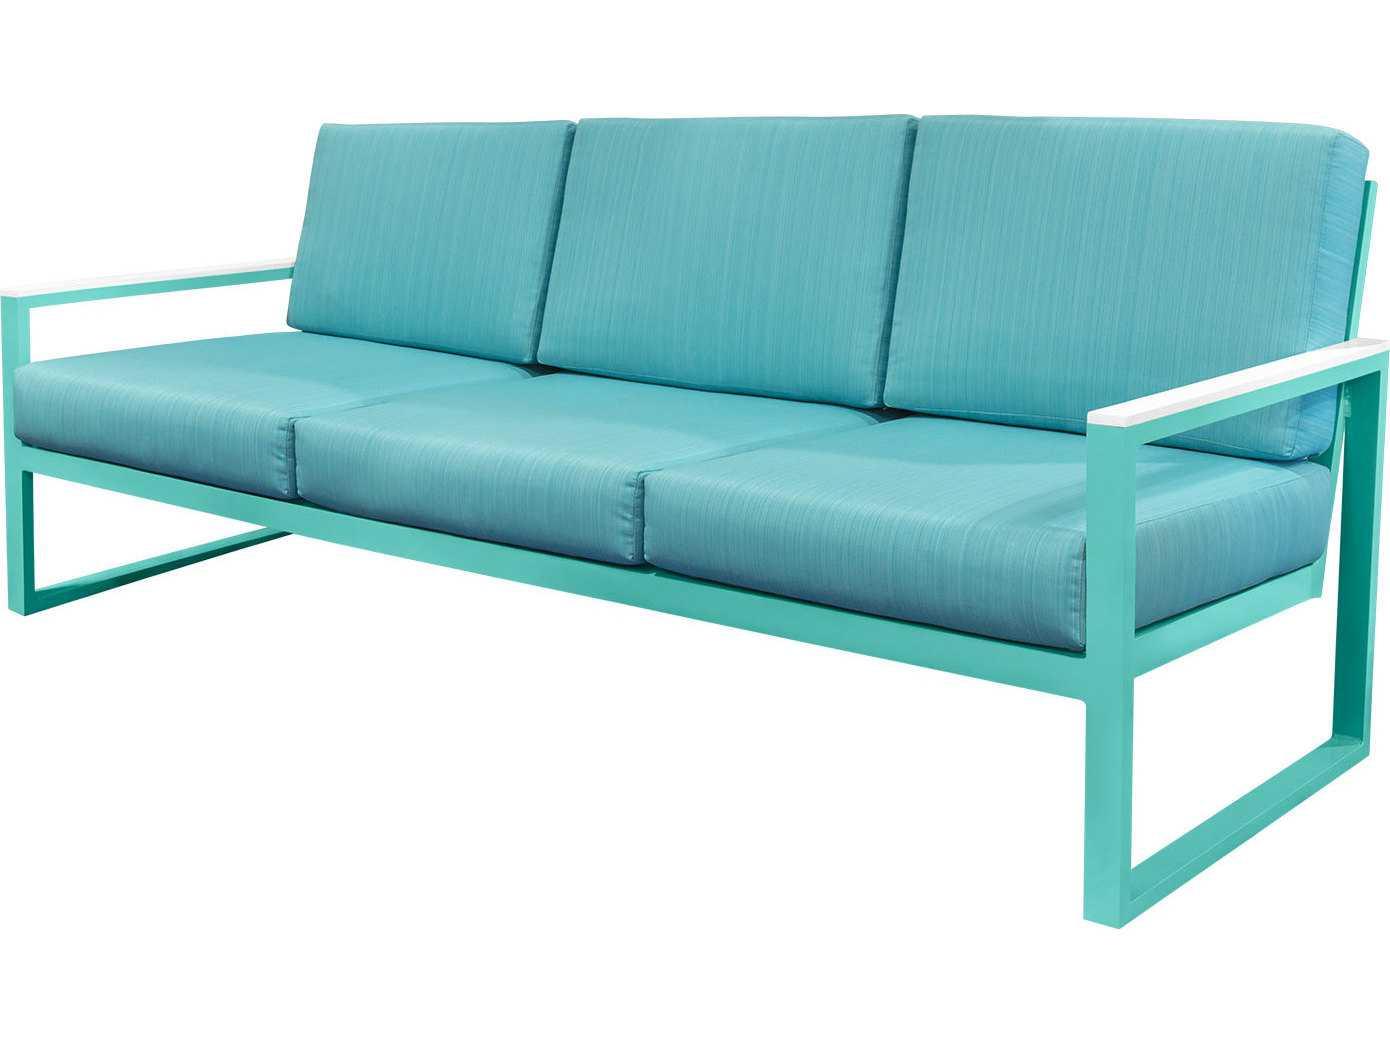 Source outdoor furniture modera aluminum sofa so 3203 103 for Source outdoor furniture